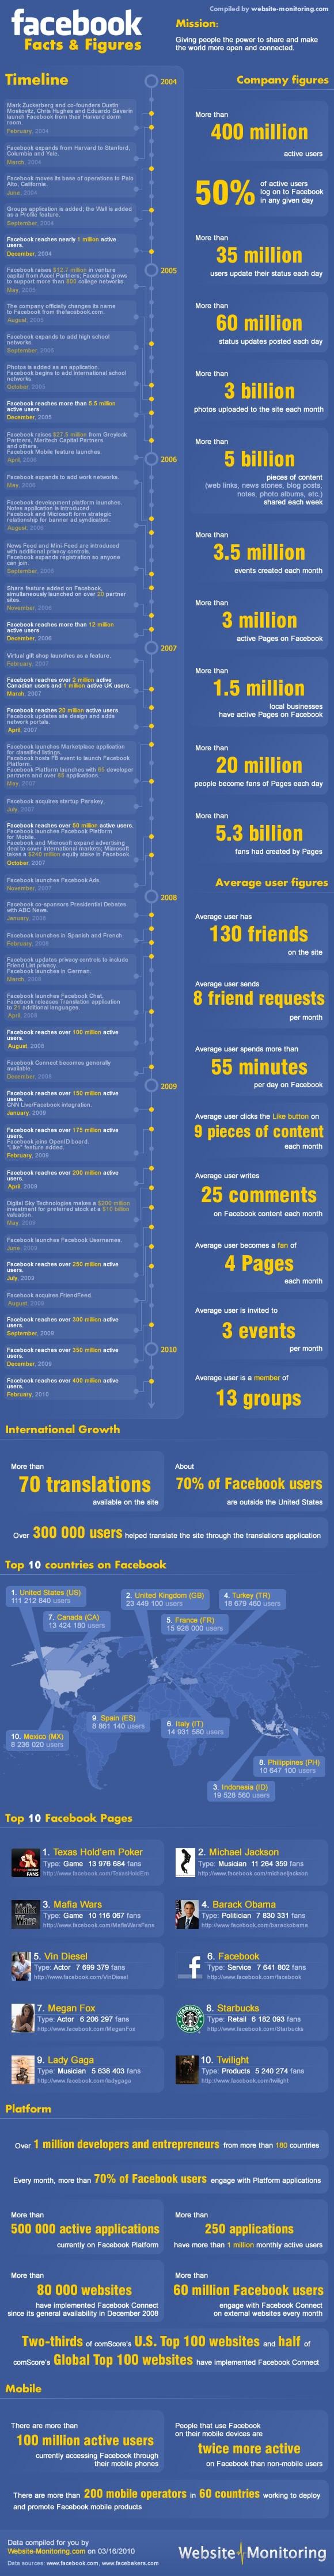 Facebook-fact-sheet